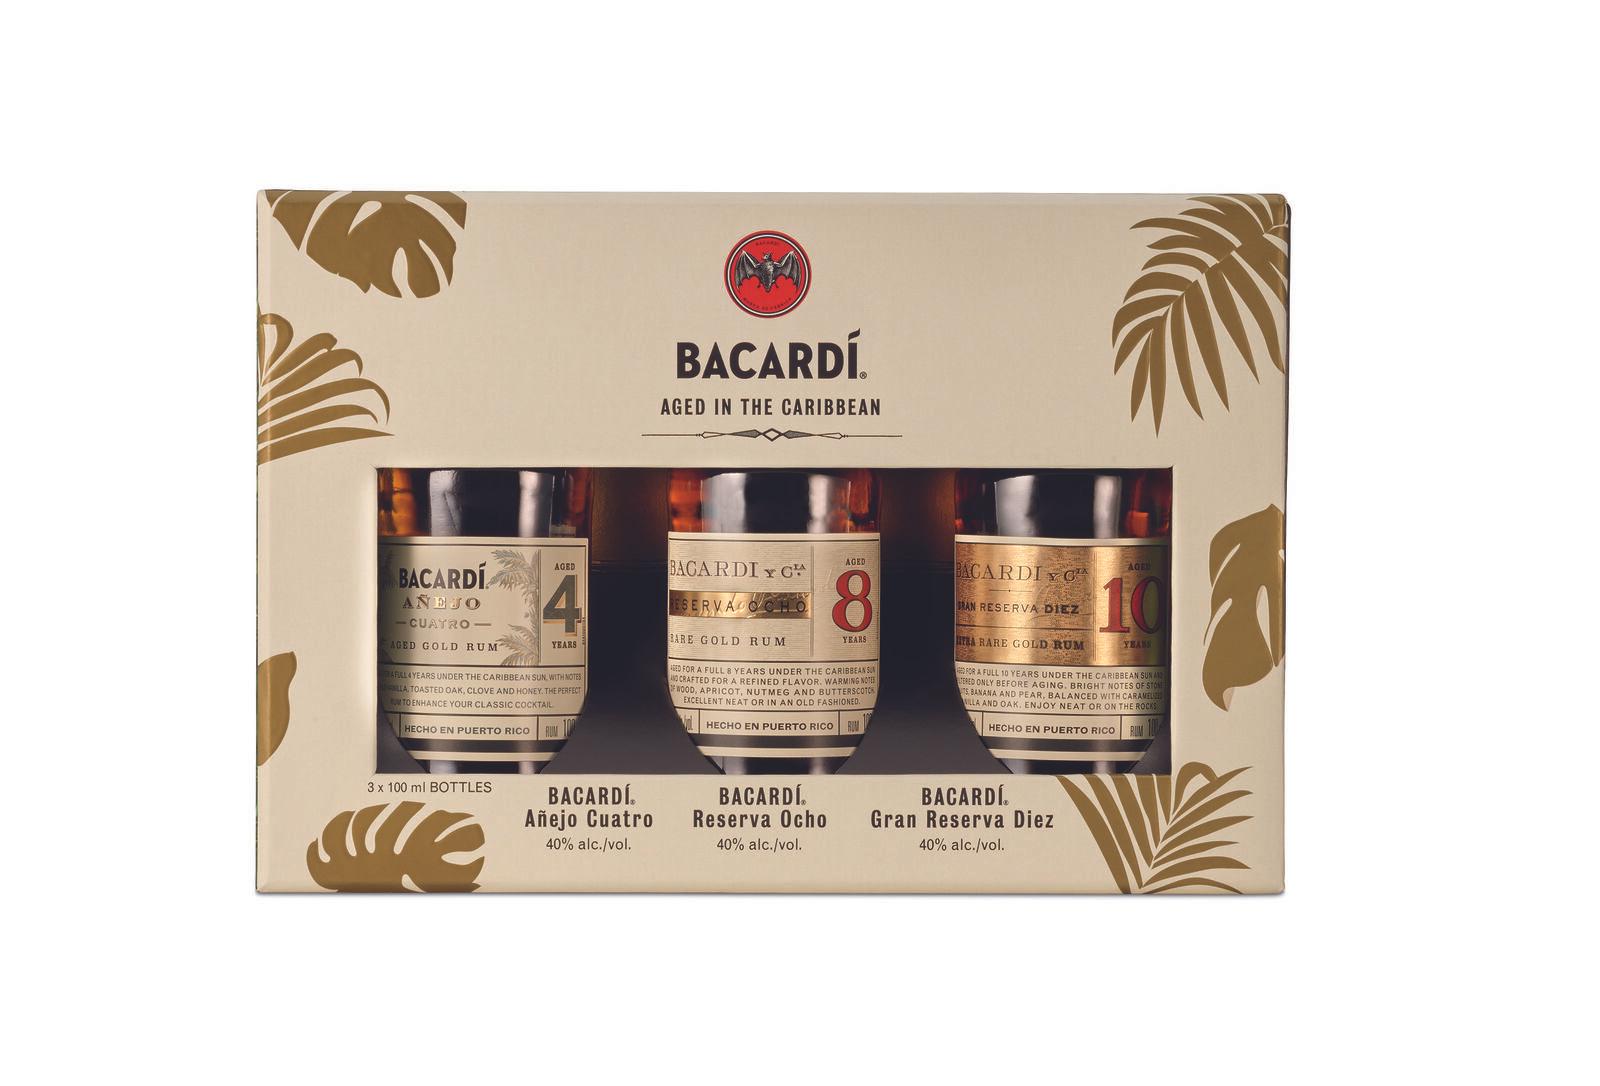 BACARDI Premium Discovery Pack (Cuatro, Ocho, Diez Miniaturen 3x 10cl 40% Vol)